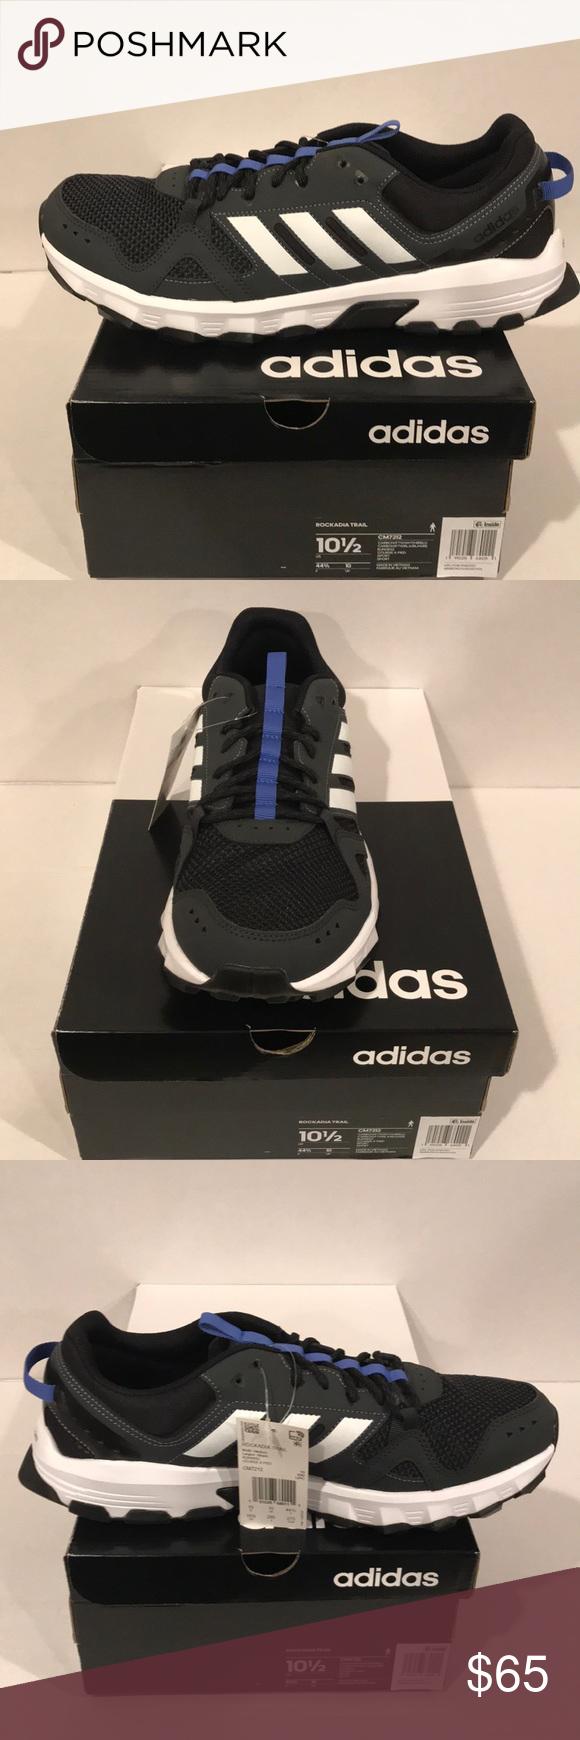 80d697df3876f adidas Running Rockadia Trail Men s Running Shoes adidas Running Rockadia  Trail Men s Running Shoes Carbon Footwear White Hi-Res Blue B15 adidas Shoes  ...